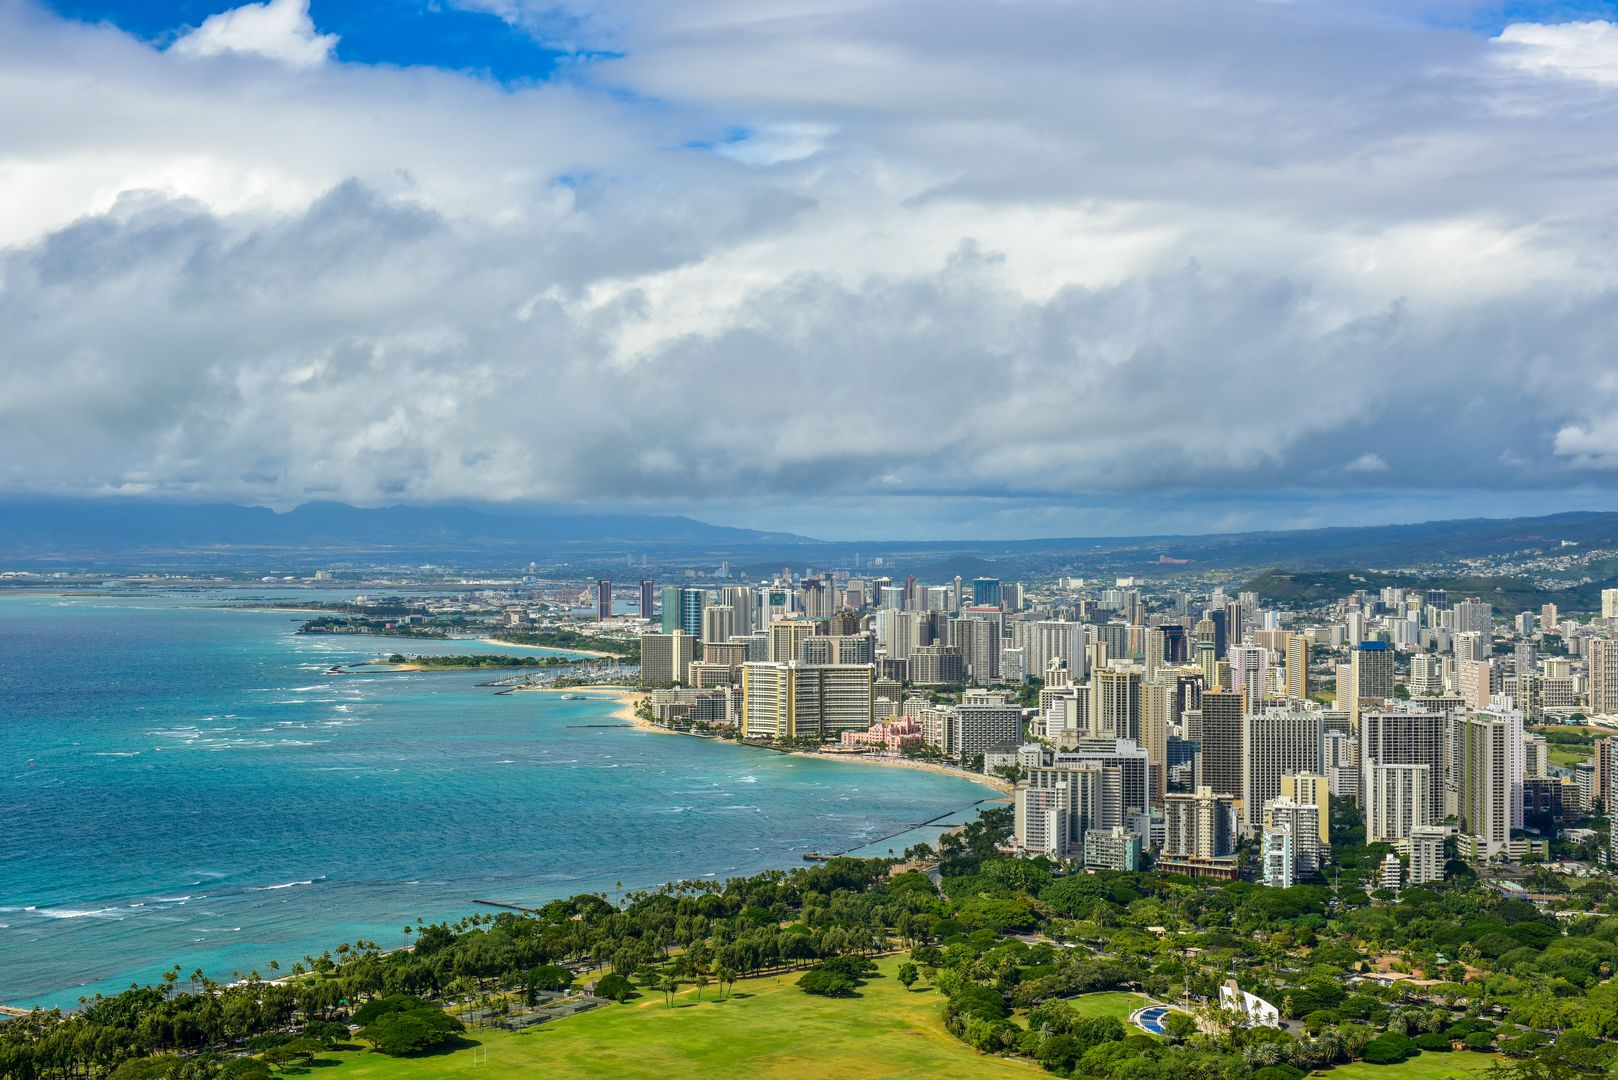 Why not try Honolulu real estate? - MyOwnHomeFinder